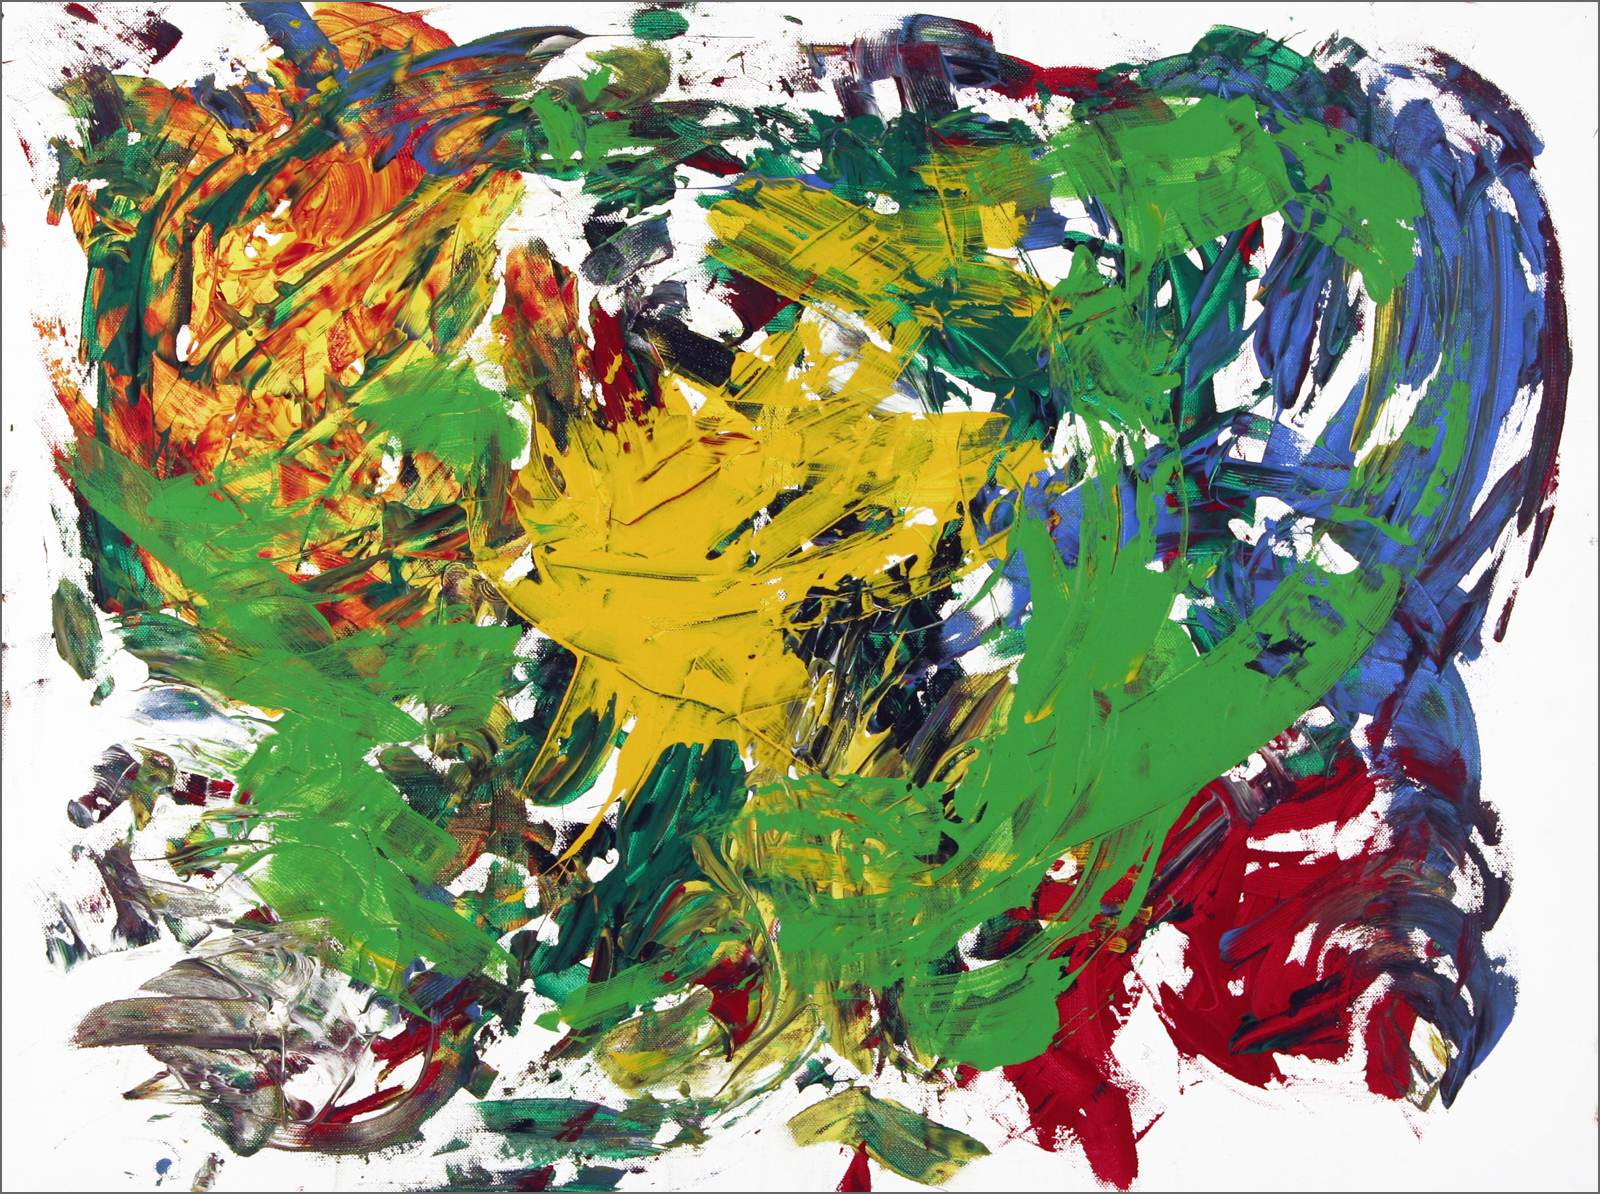 Barito | Acryl auf Leinwand | 60 x 80 cm